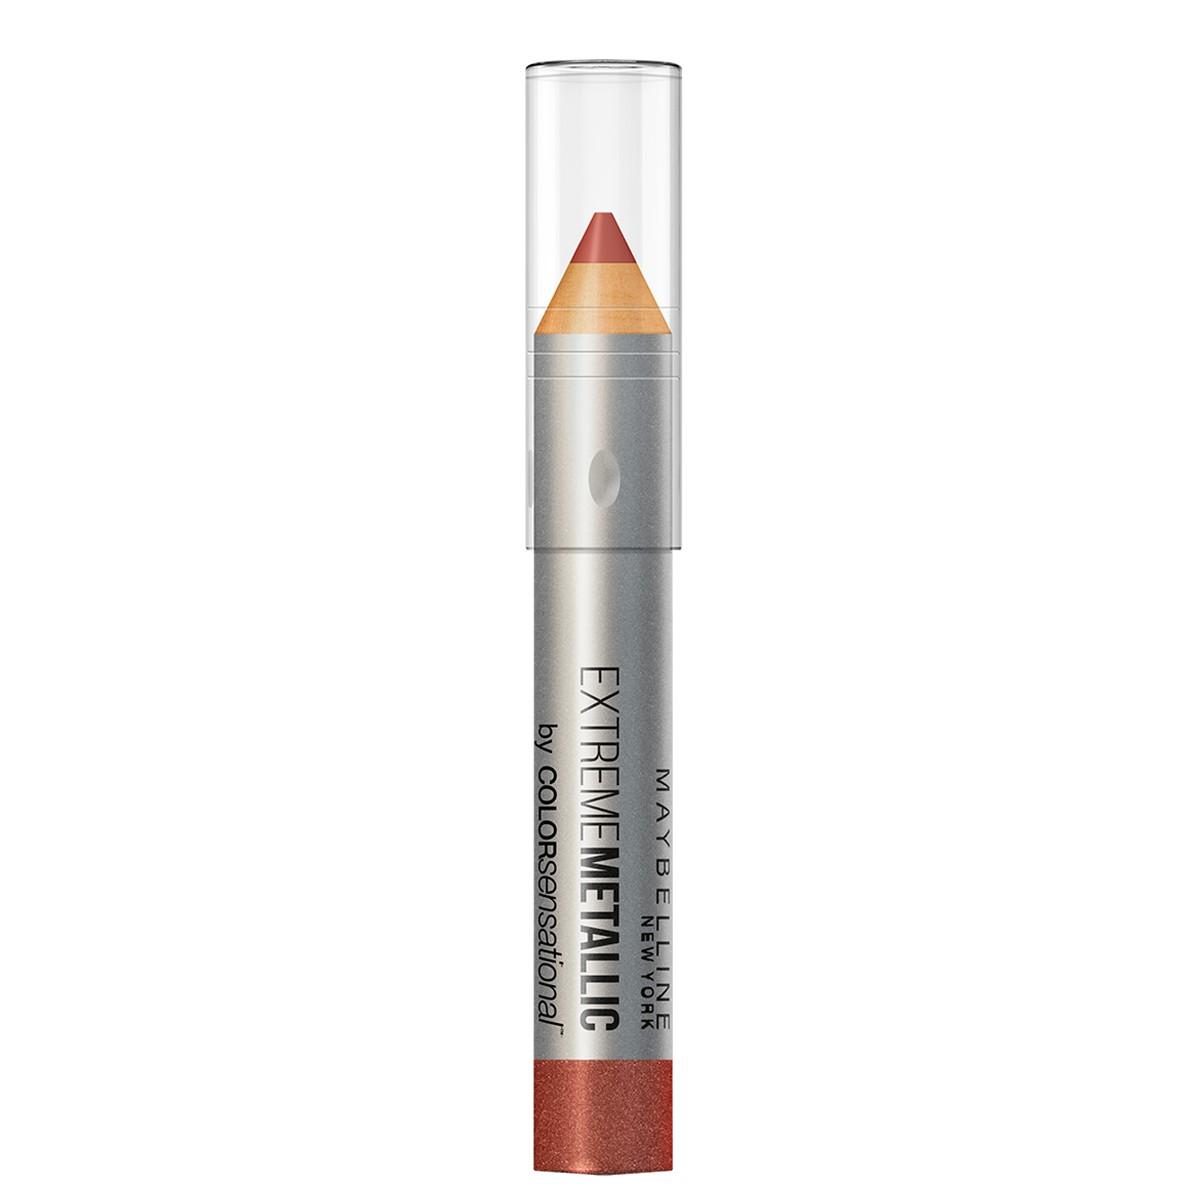 Batom Lápis Maybelline Color Sensational Extreme Metallics Nº90 Cor Deixa Eu Brilhar Maybelline 1 Unidade